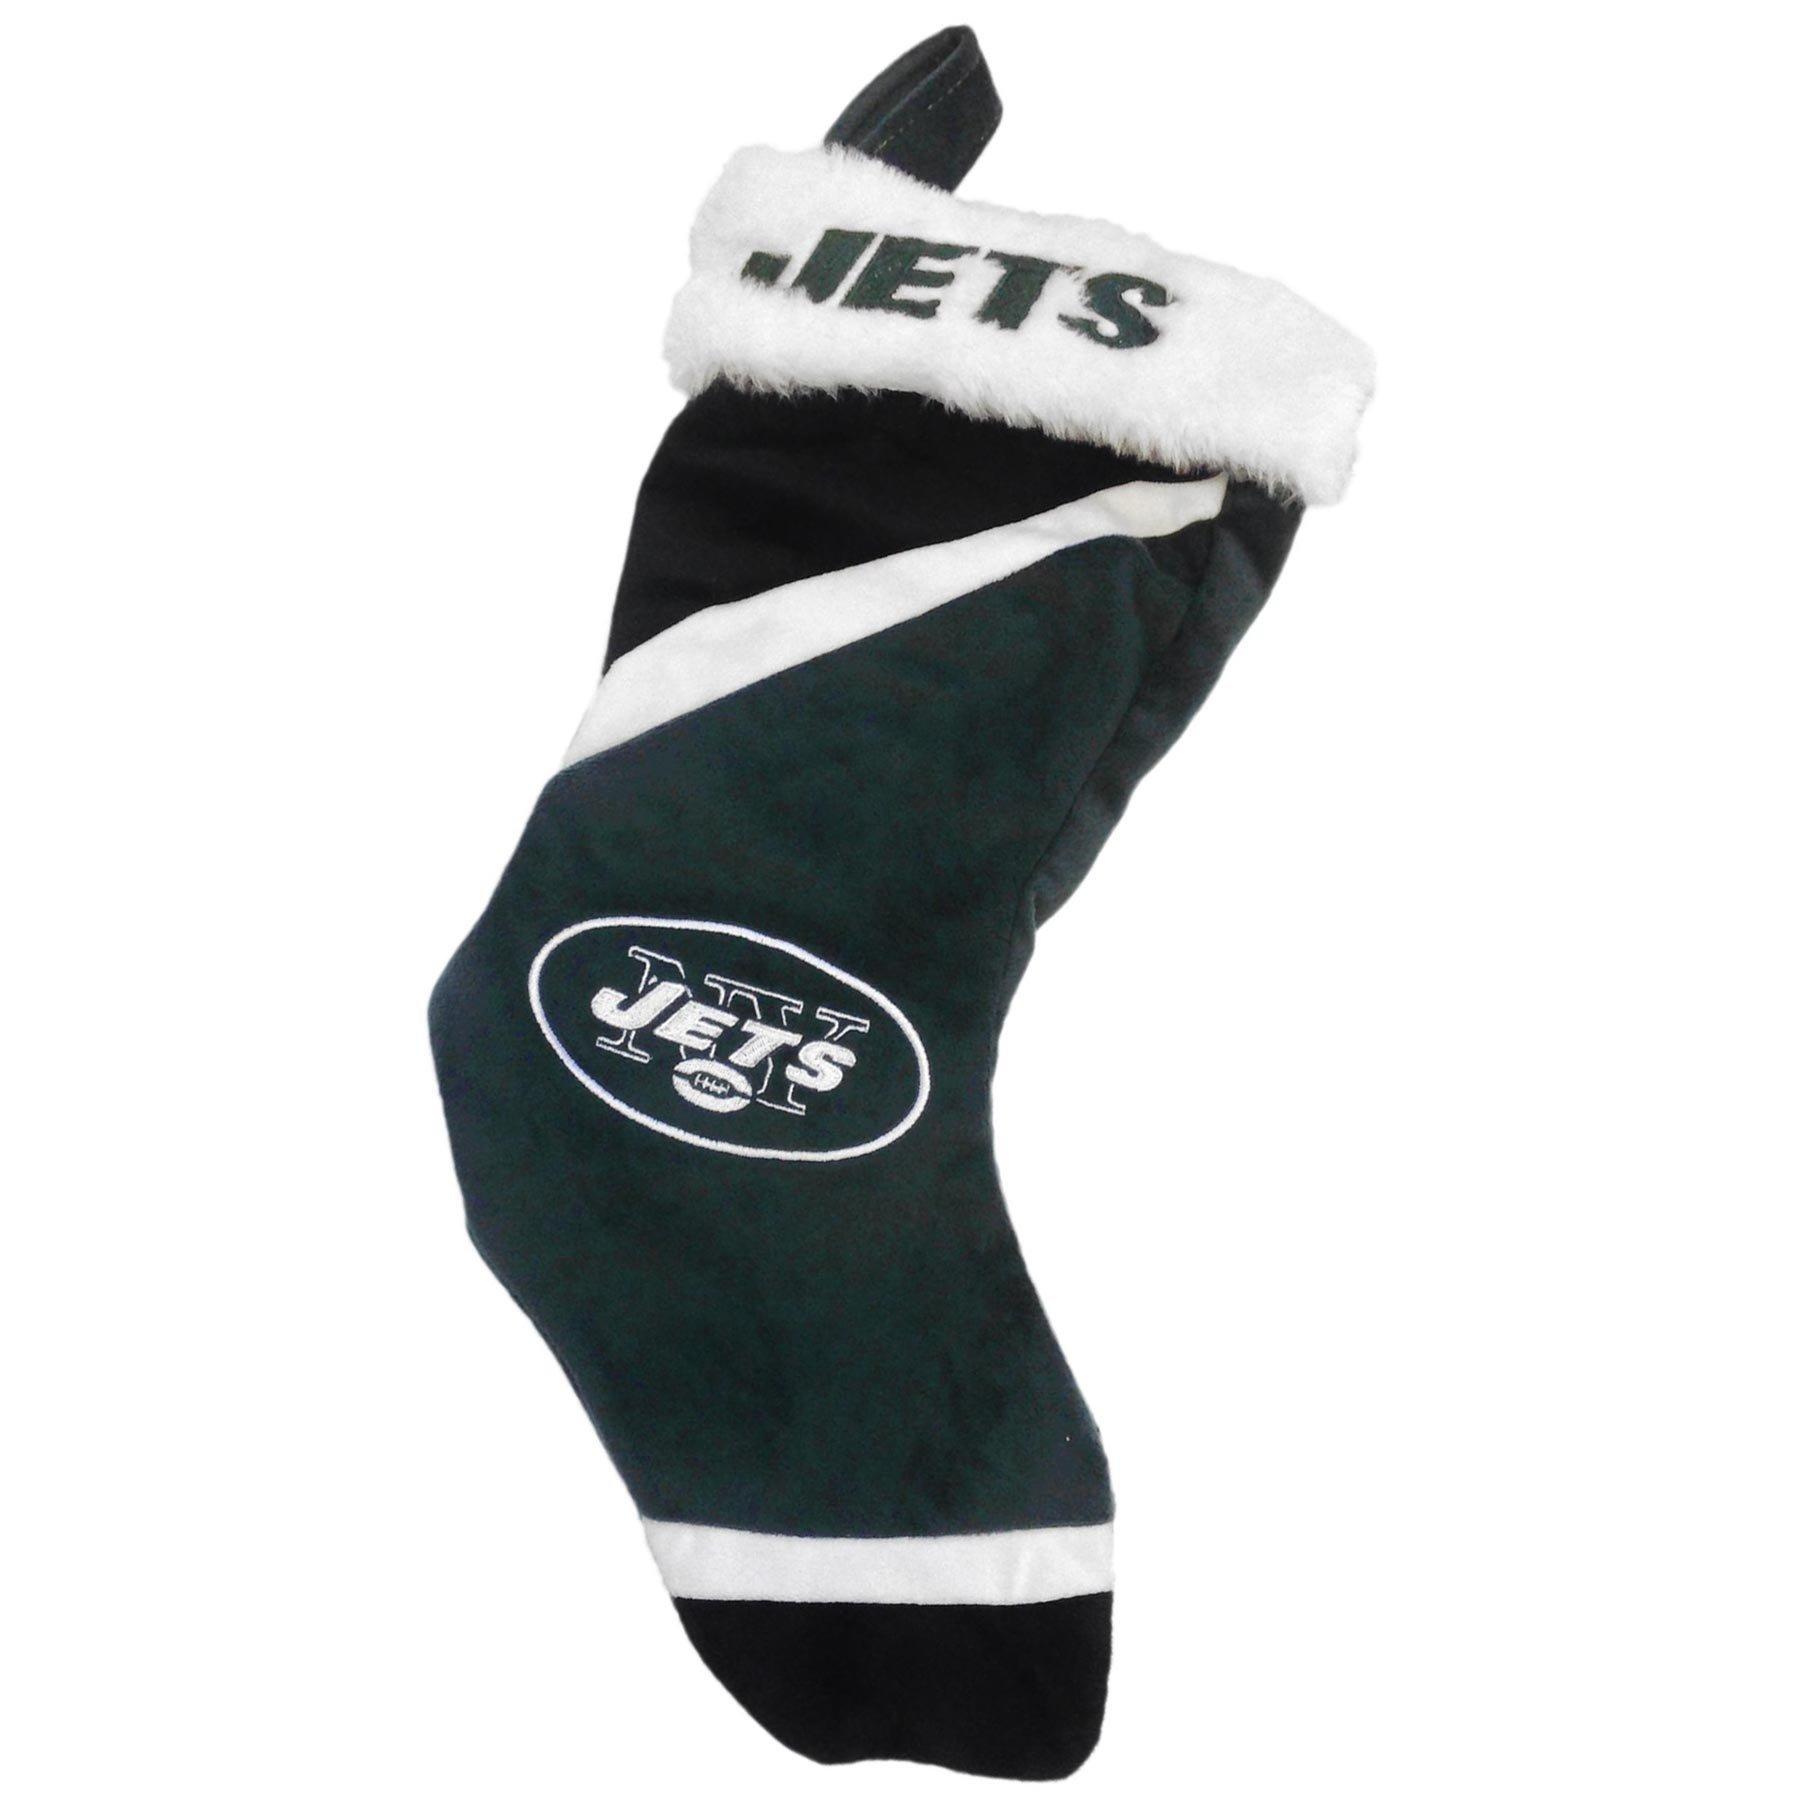 FOCO New York Jets 2014 Colorblock Stocking